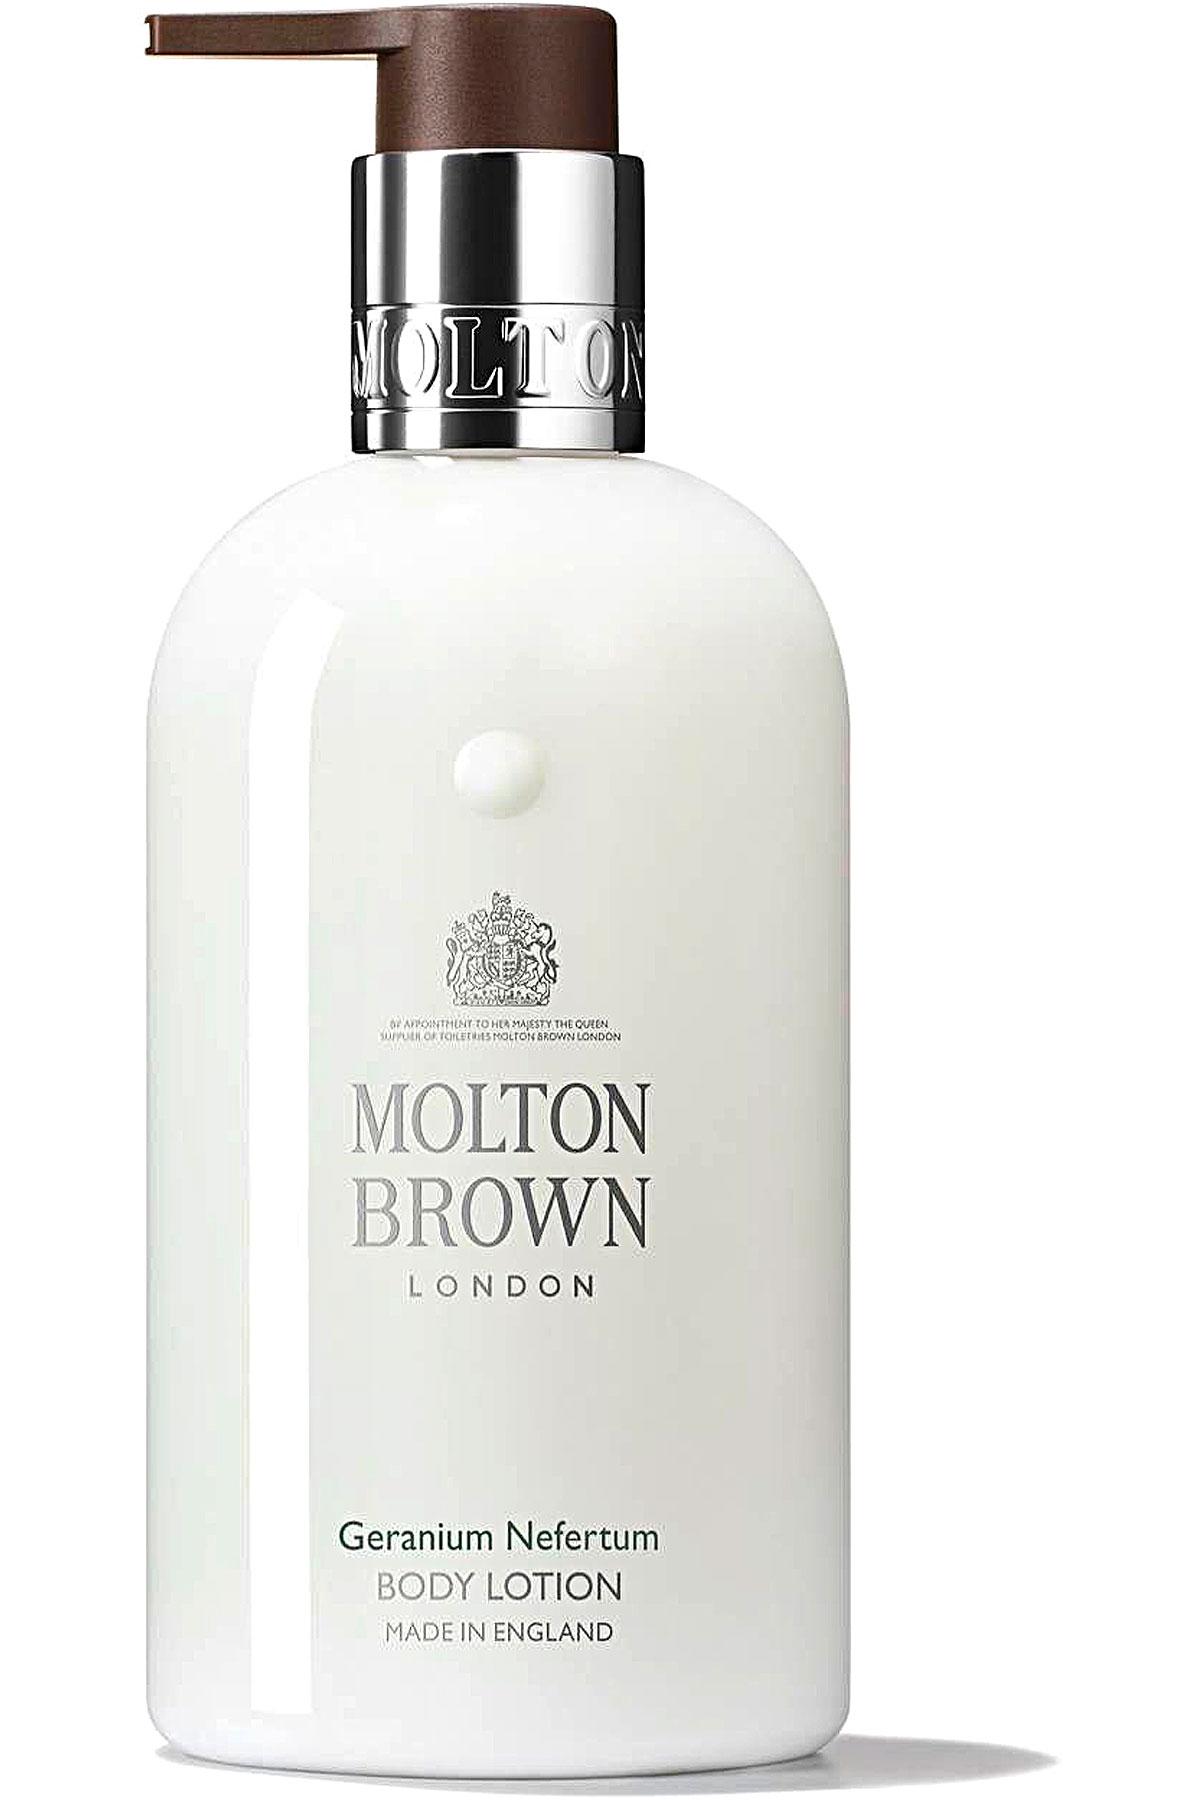 Molton Brown Beauty for Men, Geranium Nefertum - Body Lotion - 300 Ml, 2019, 300 ml